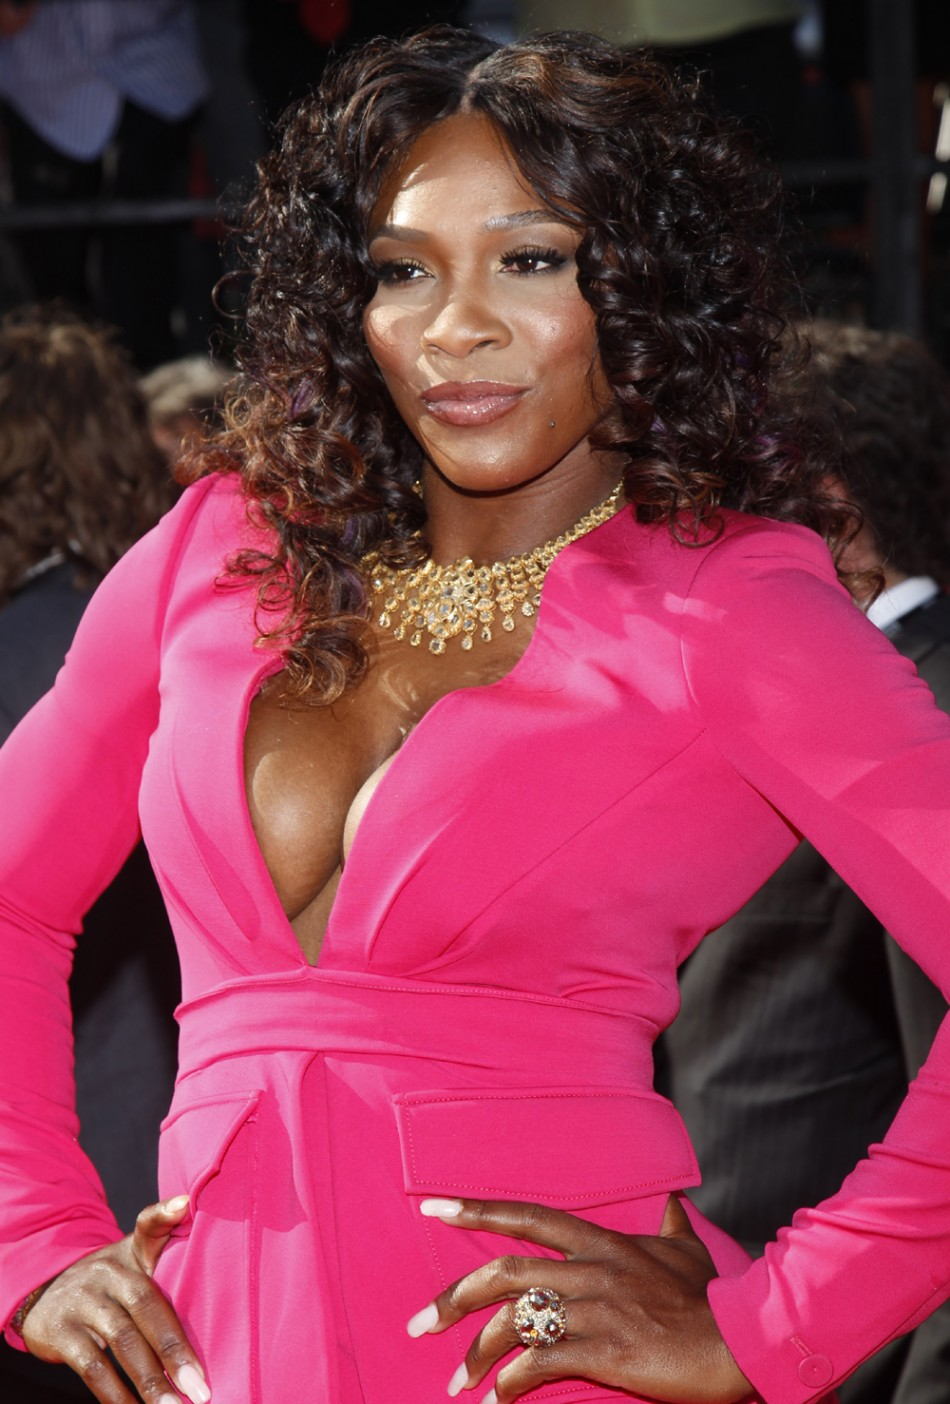 Cleavage Serena Williams nude photos 2019